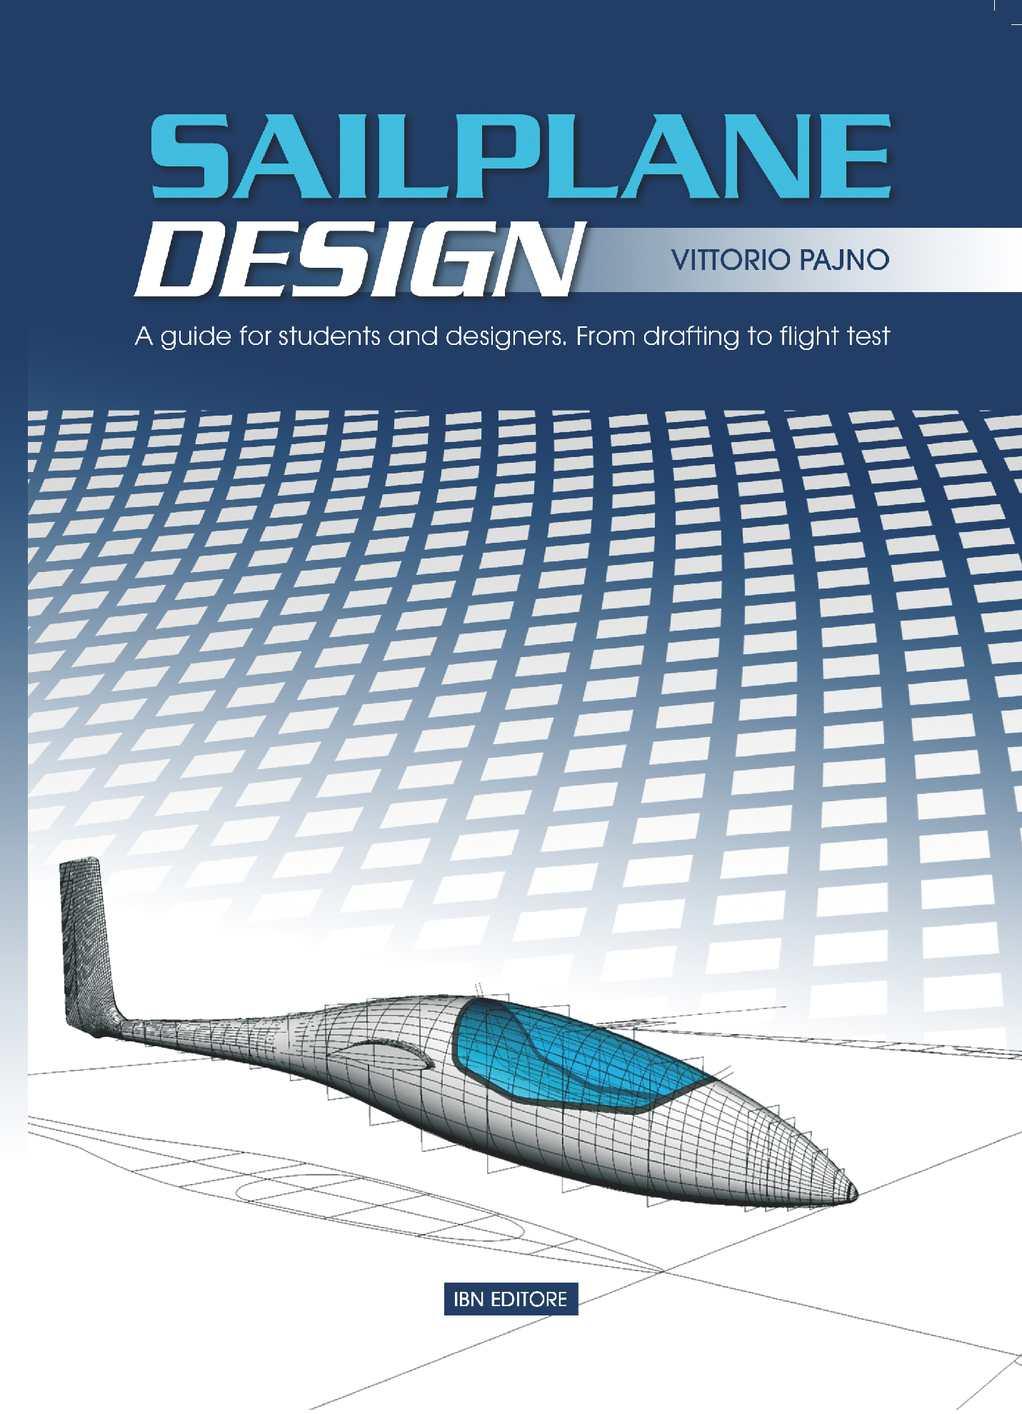 Pajno V., Sailplane Design